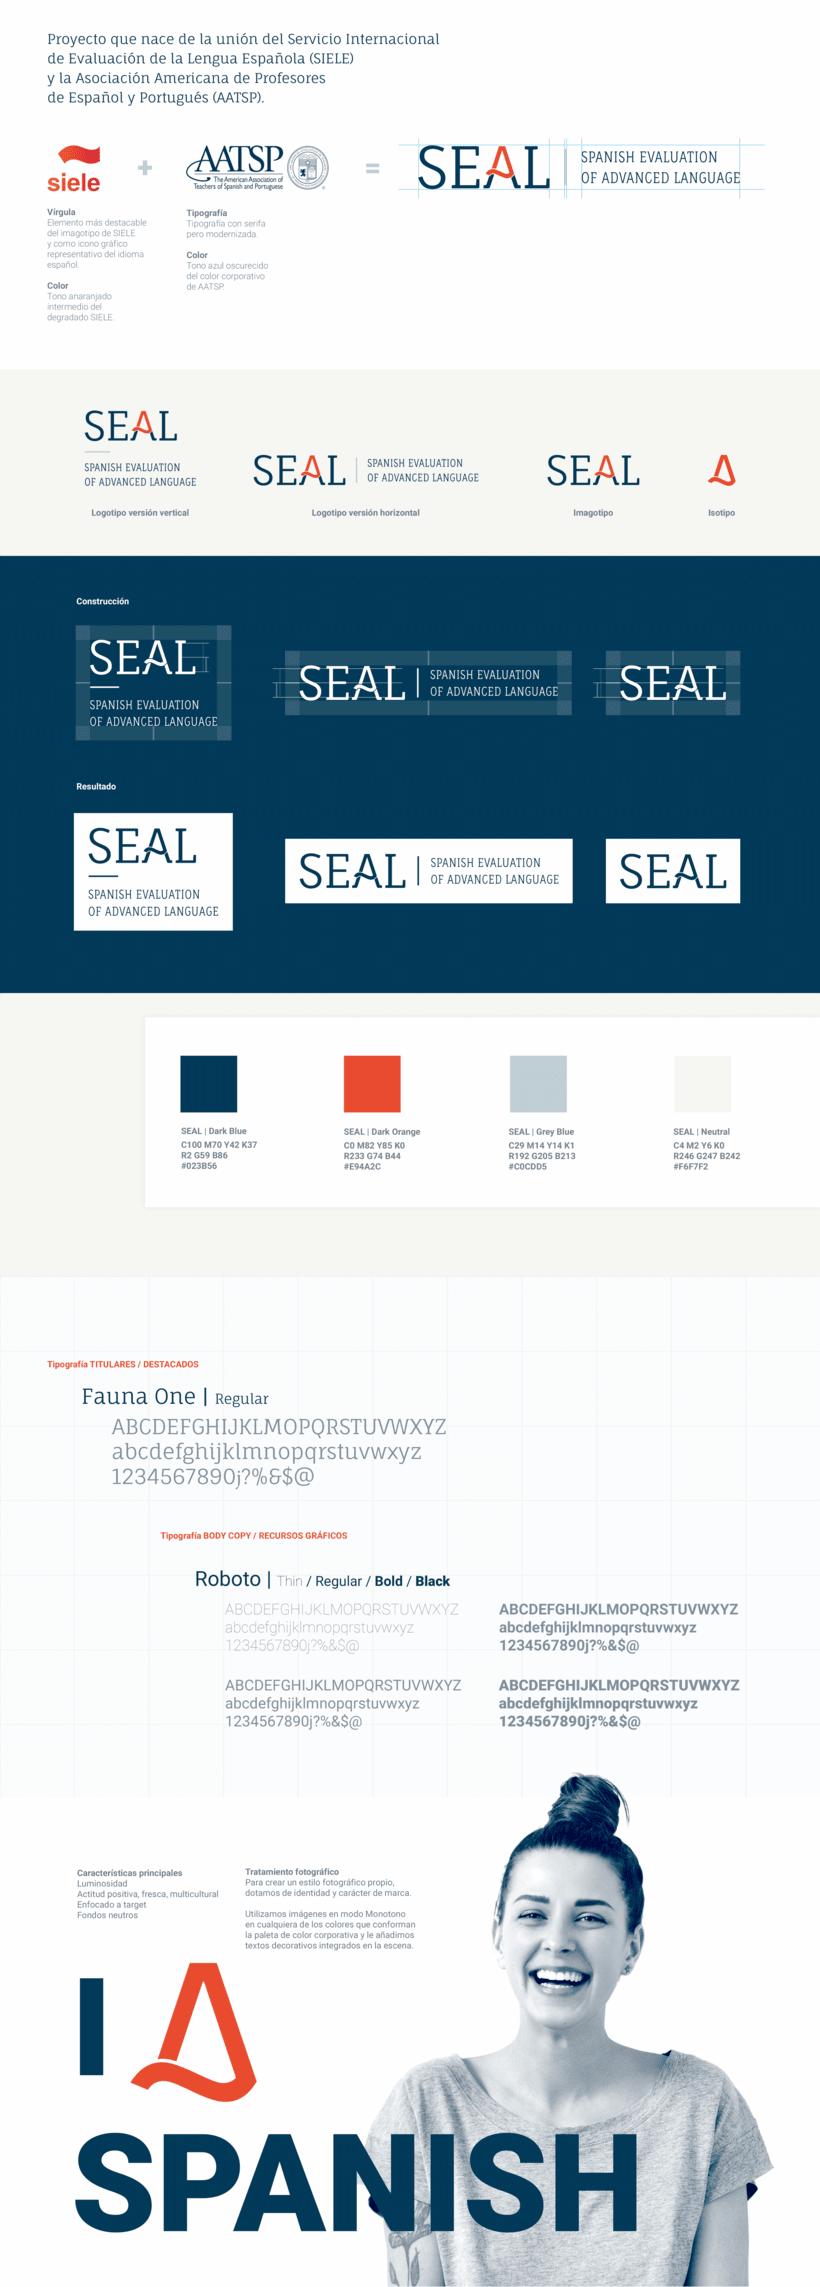 SEAL, Spanish Evaluation of Advanced Language 1